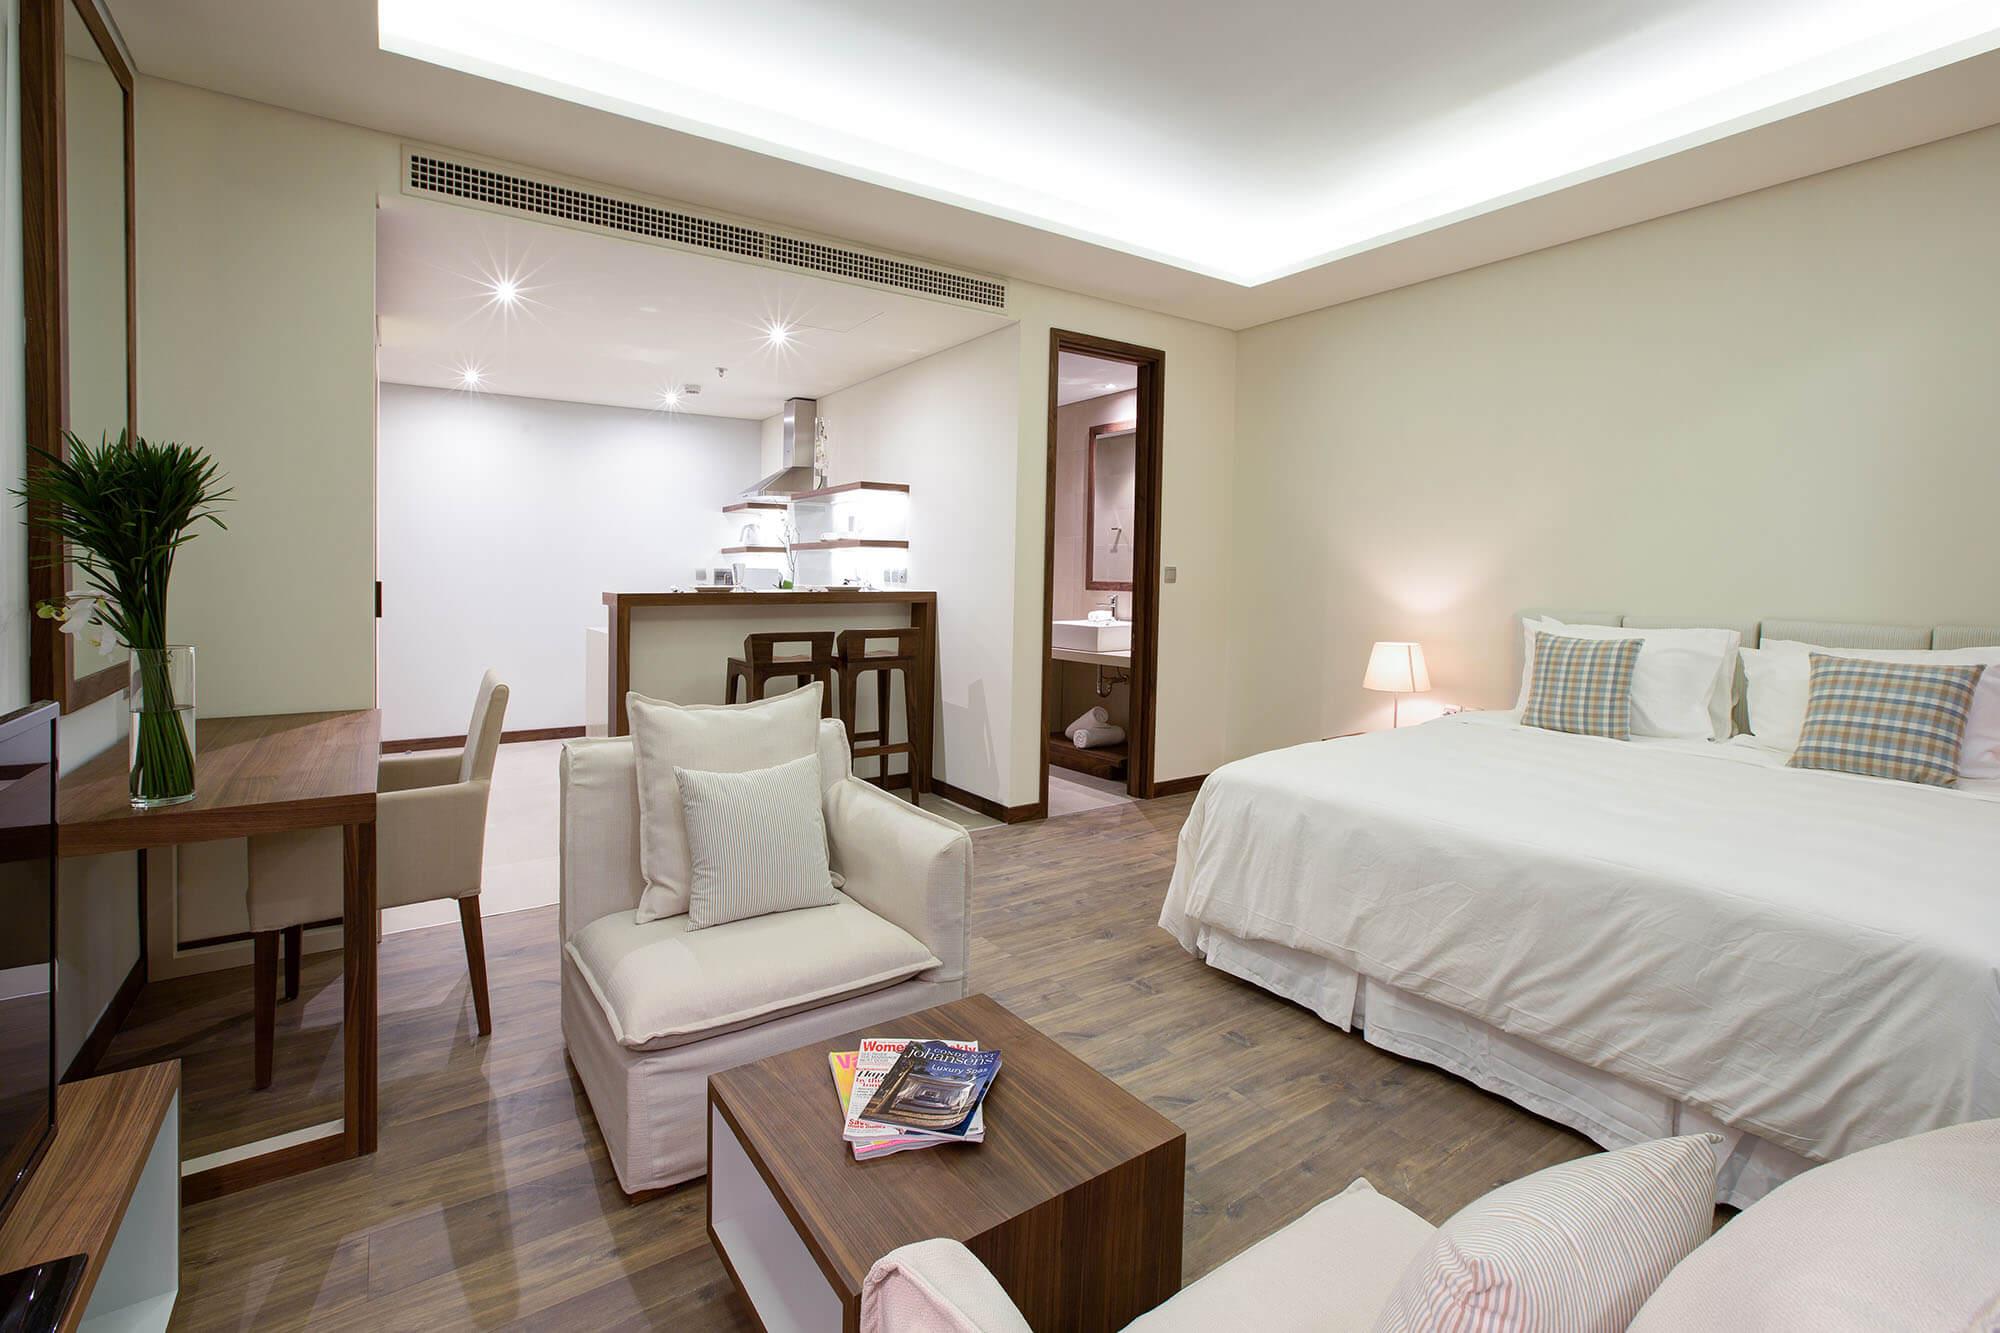 Light Plus Studio A La Carte Danang Beach Hotel 200 Vo Nguyen Giap Danang Fantasticity Com